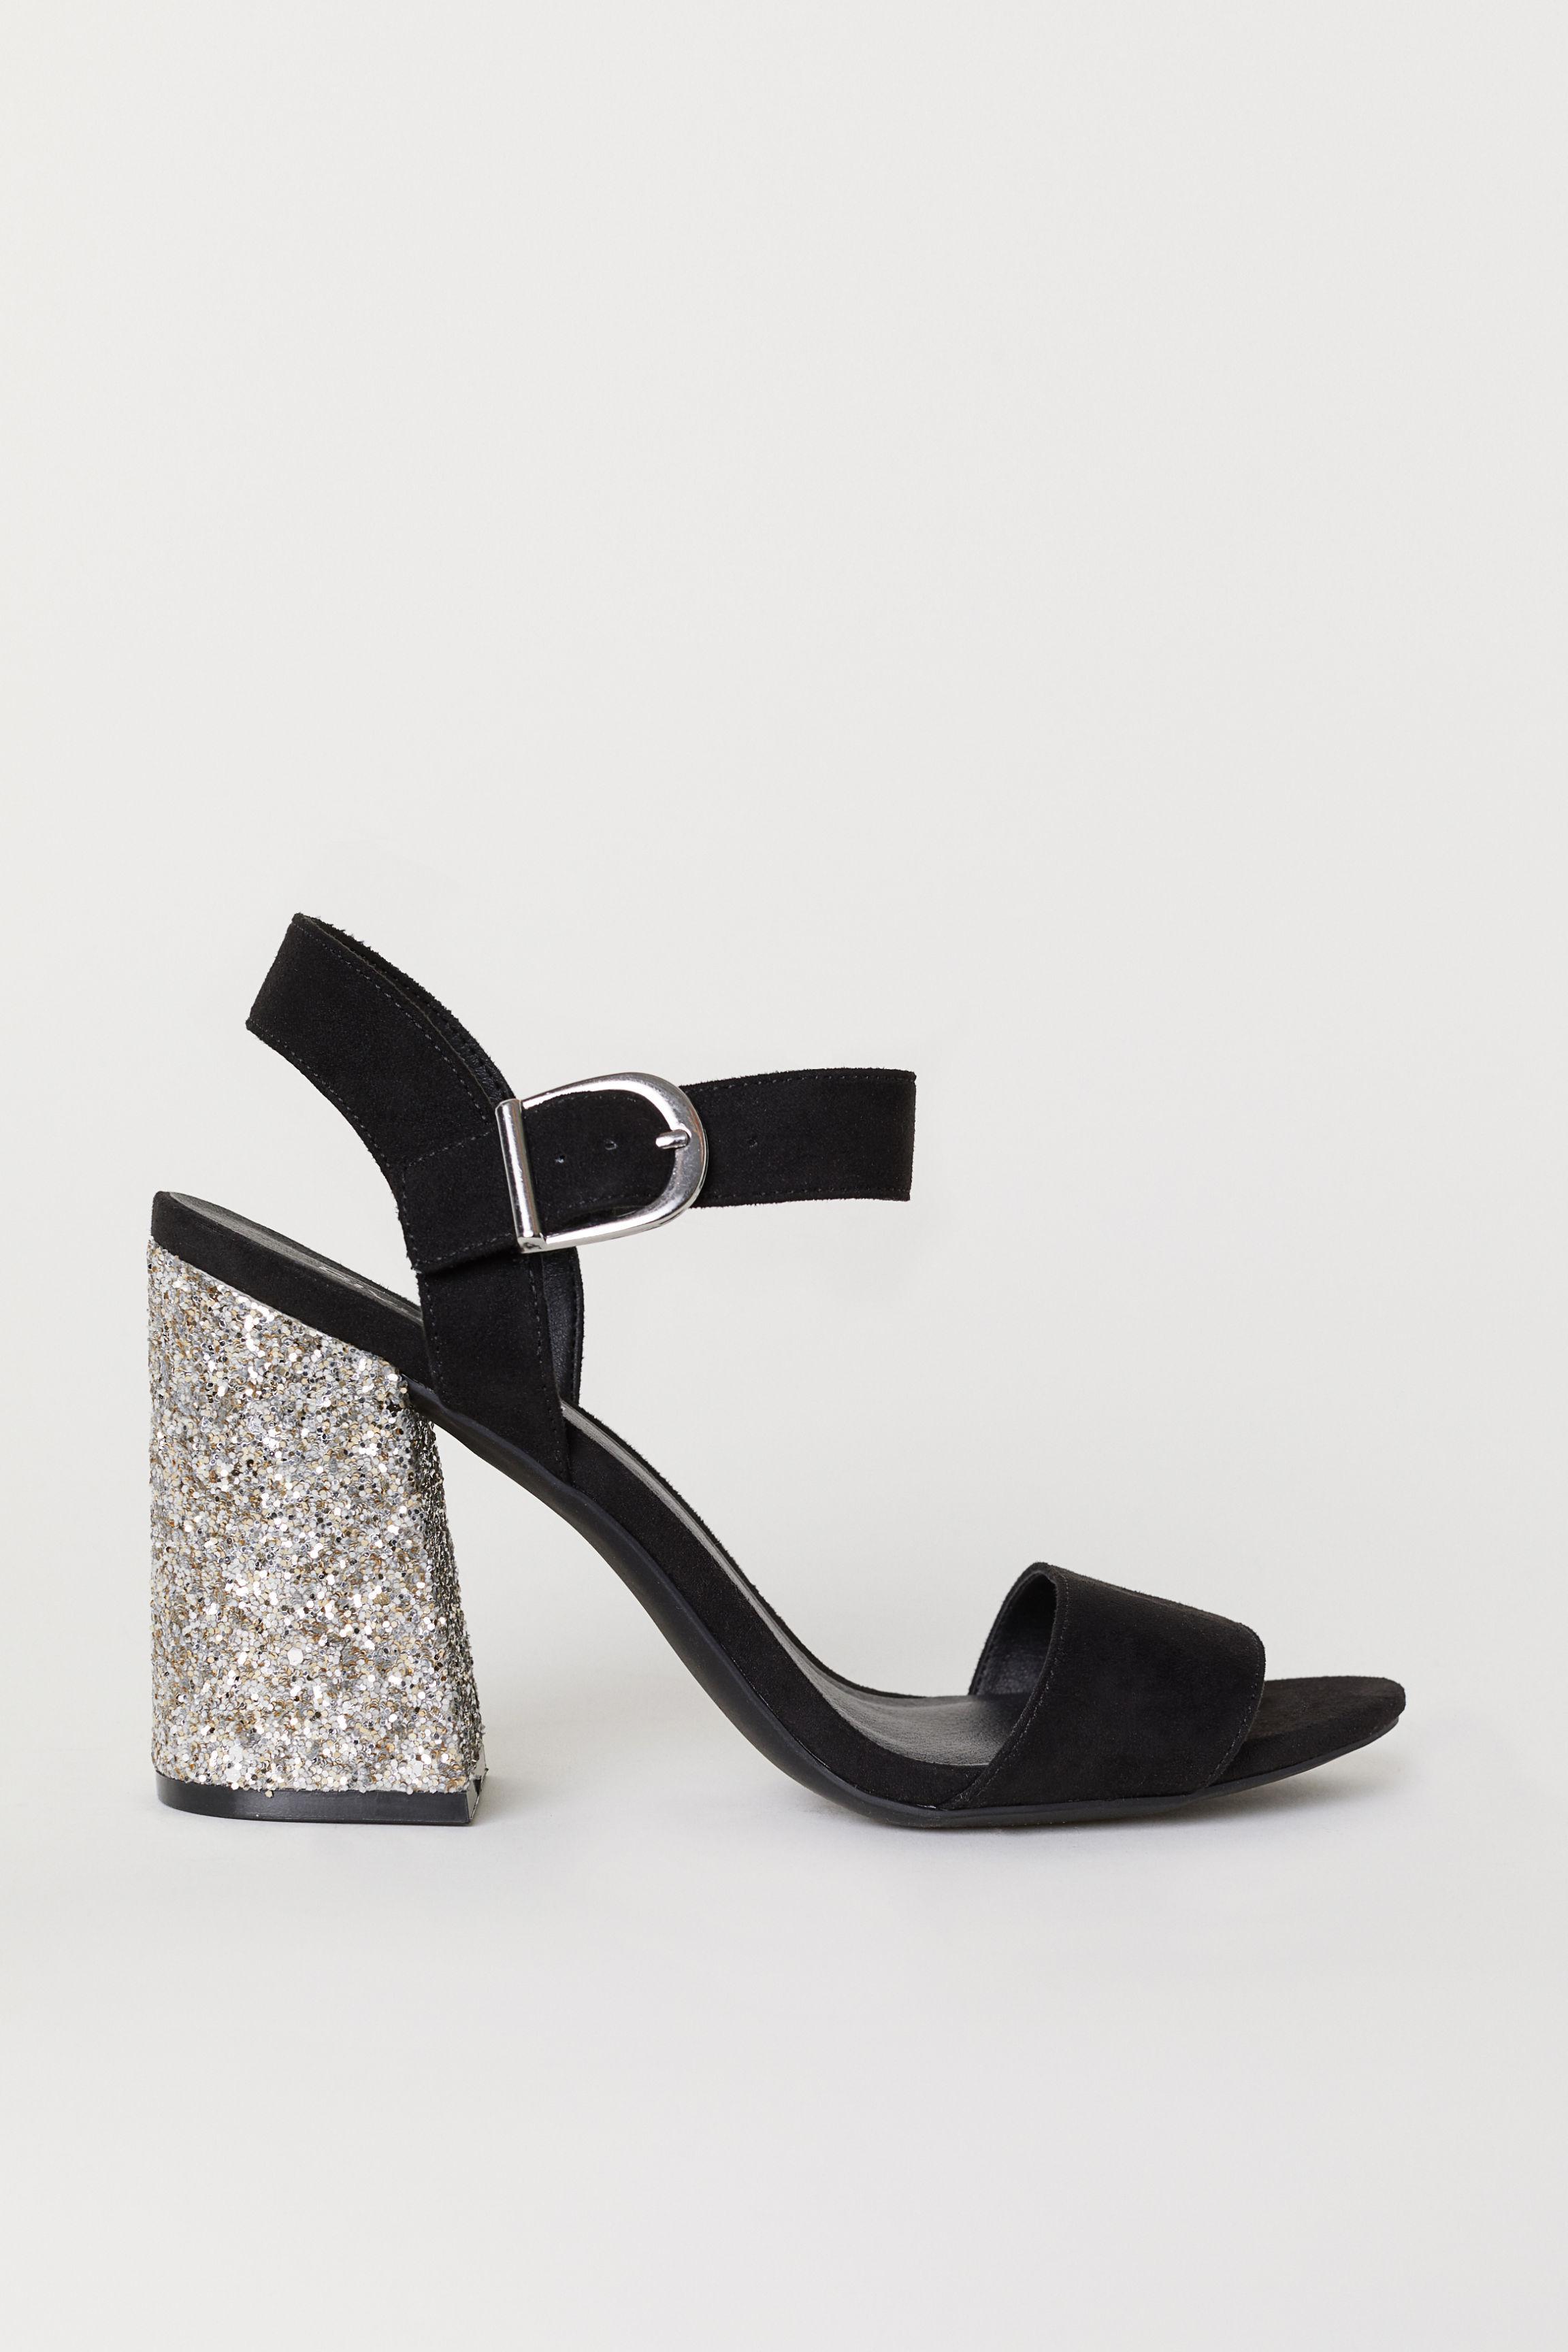 5ed19260dd Lyst - H M Block-heeled Sandals in Black